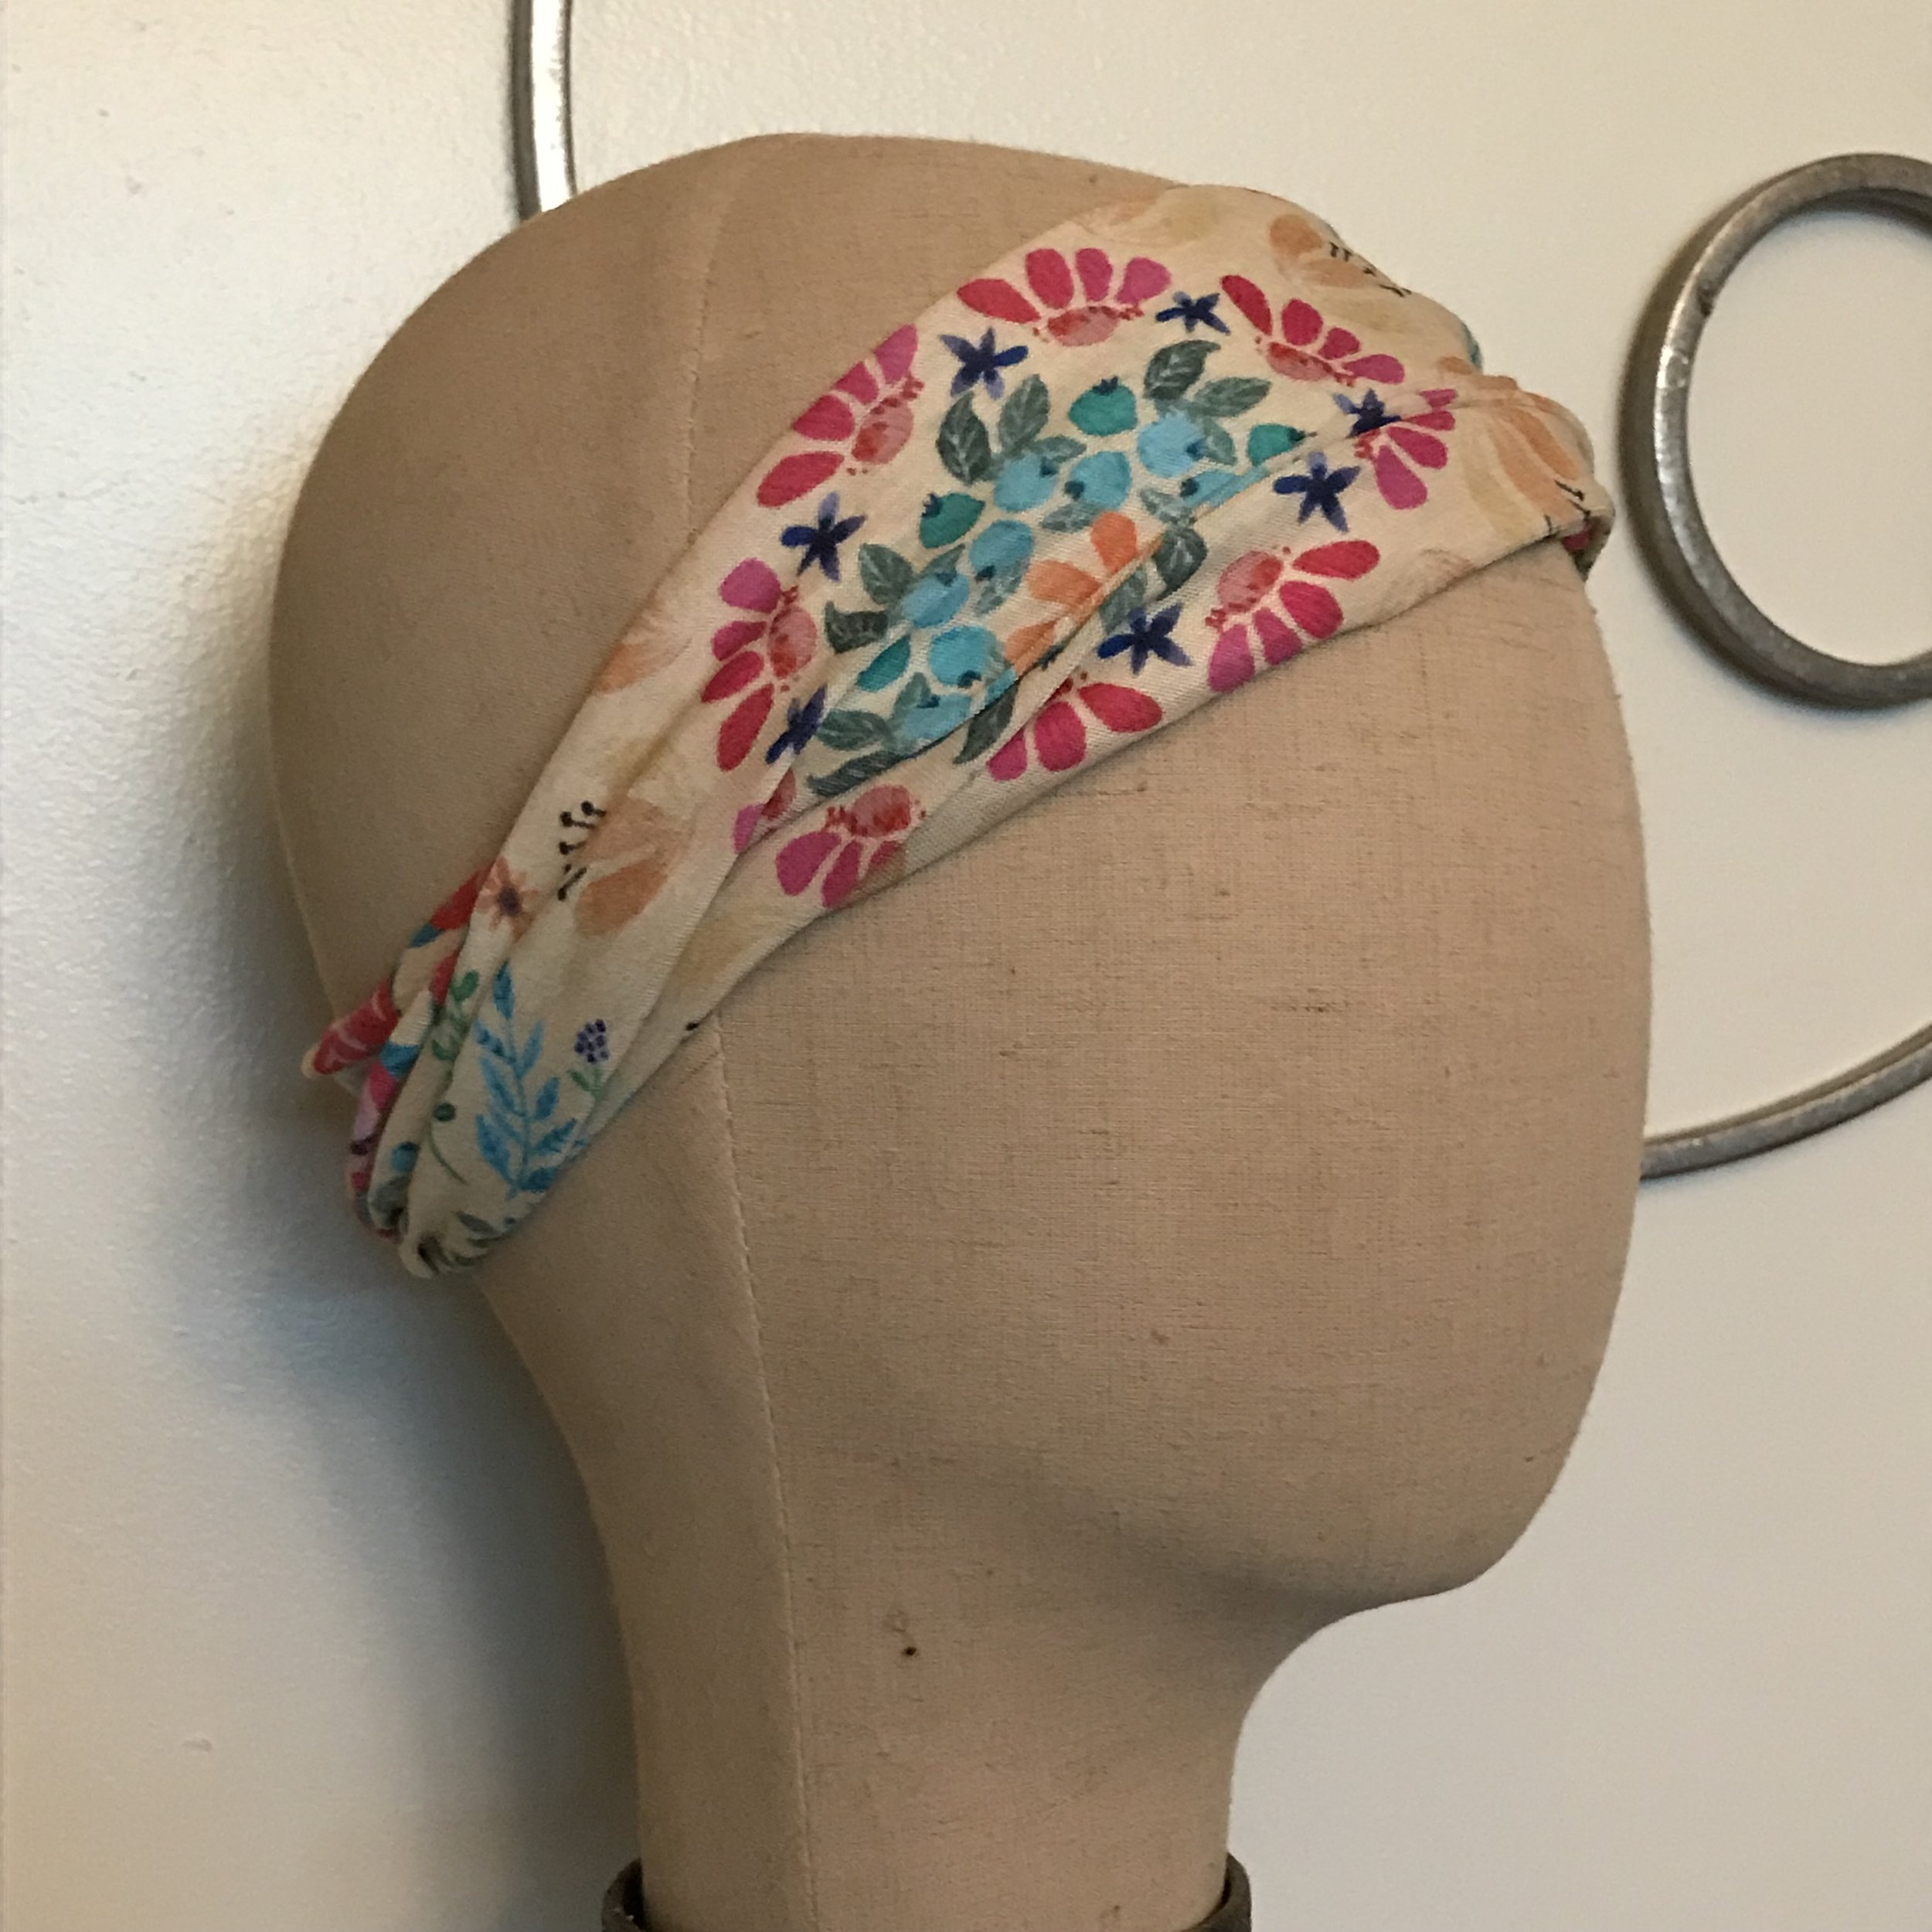 Floral Half Headband $6